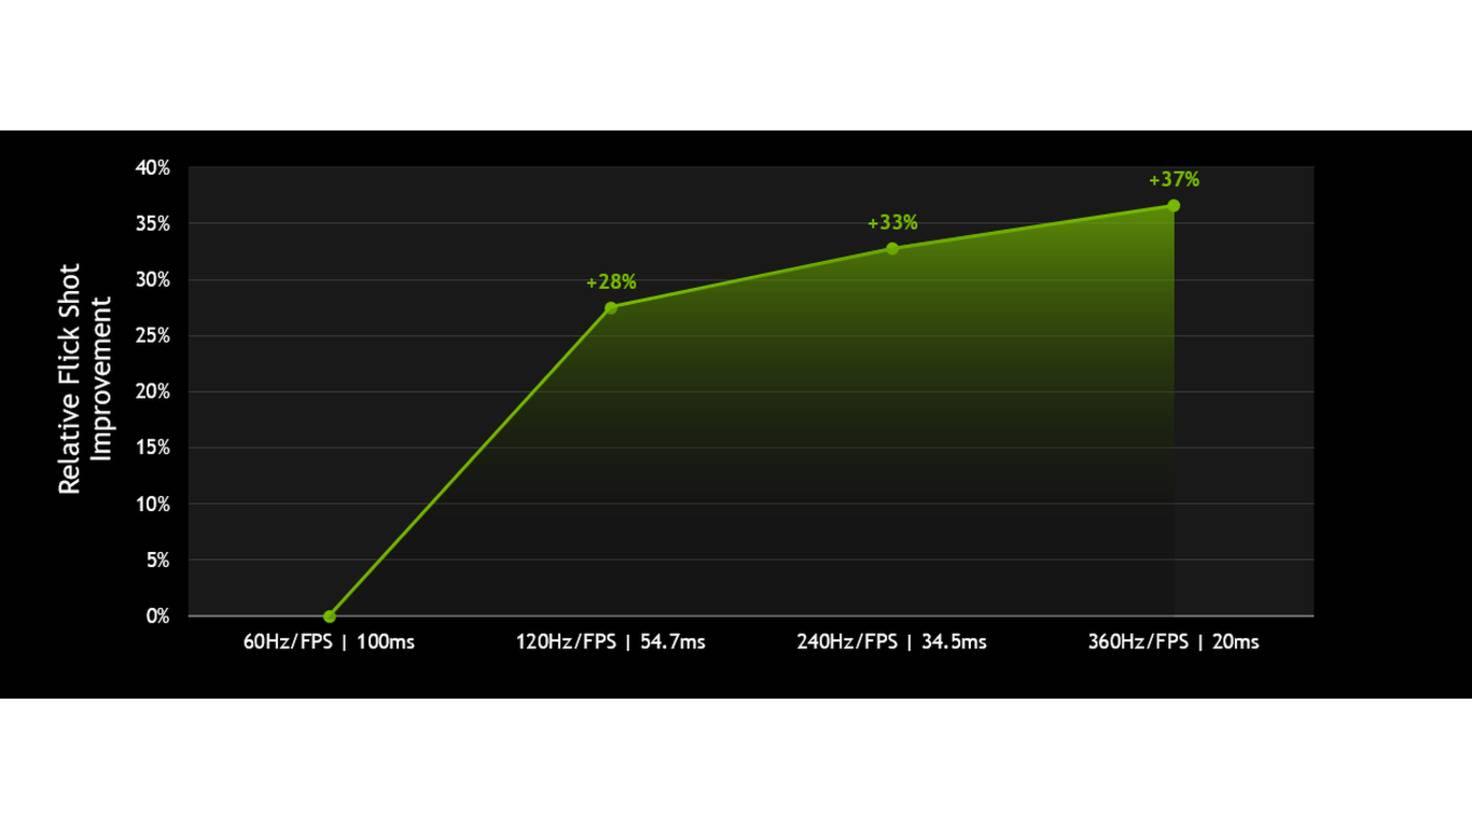 nvidia-geforce-relative-flick-shot-improvement-chart-360-hertz